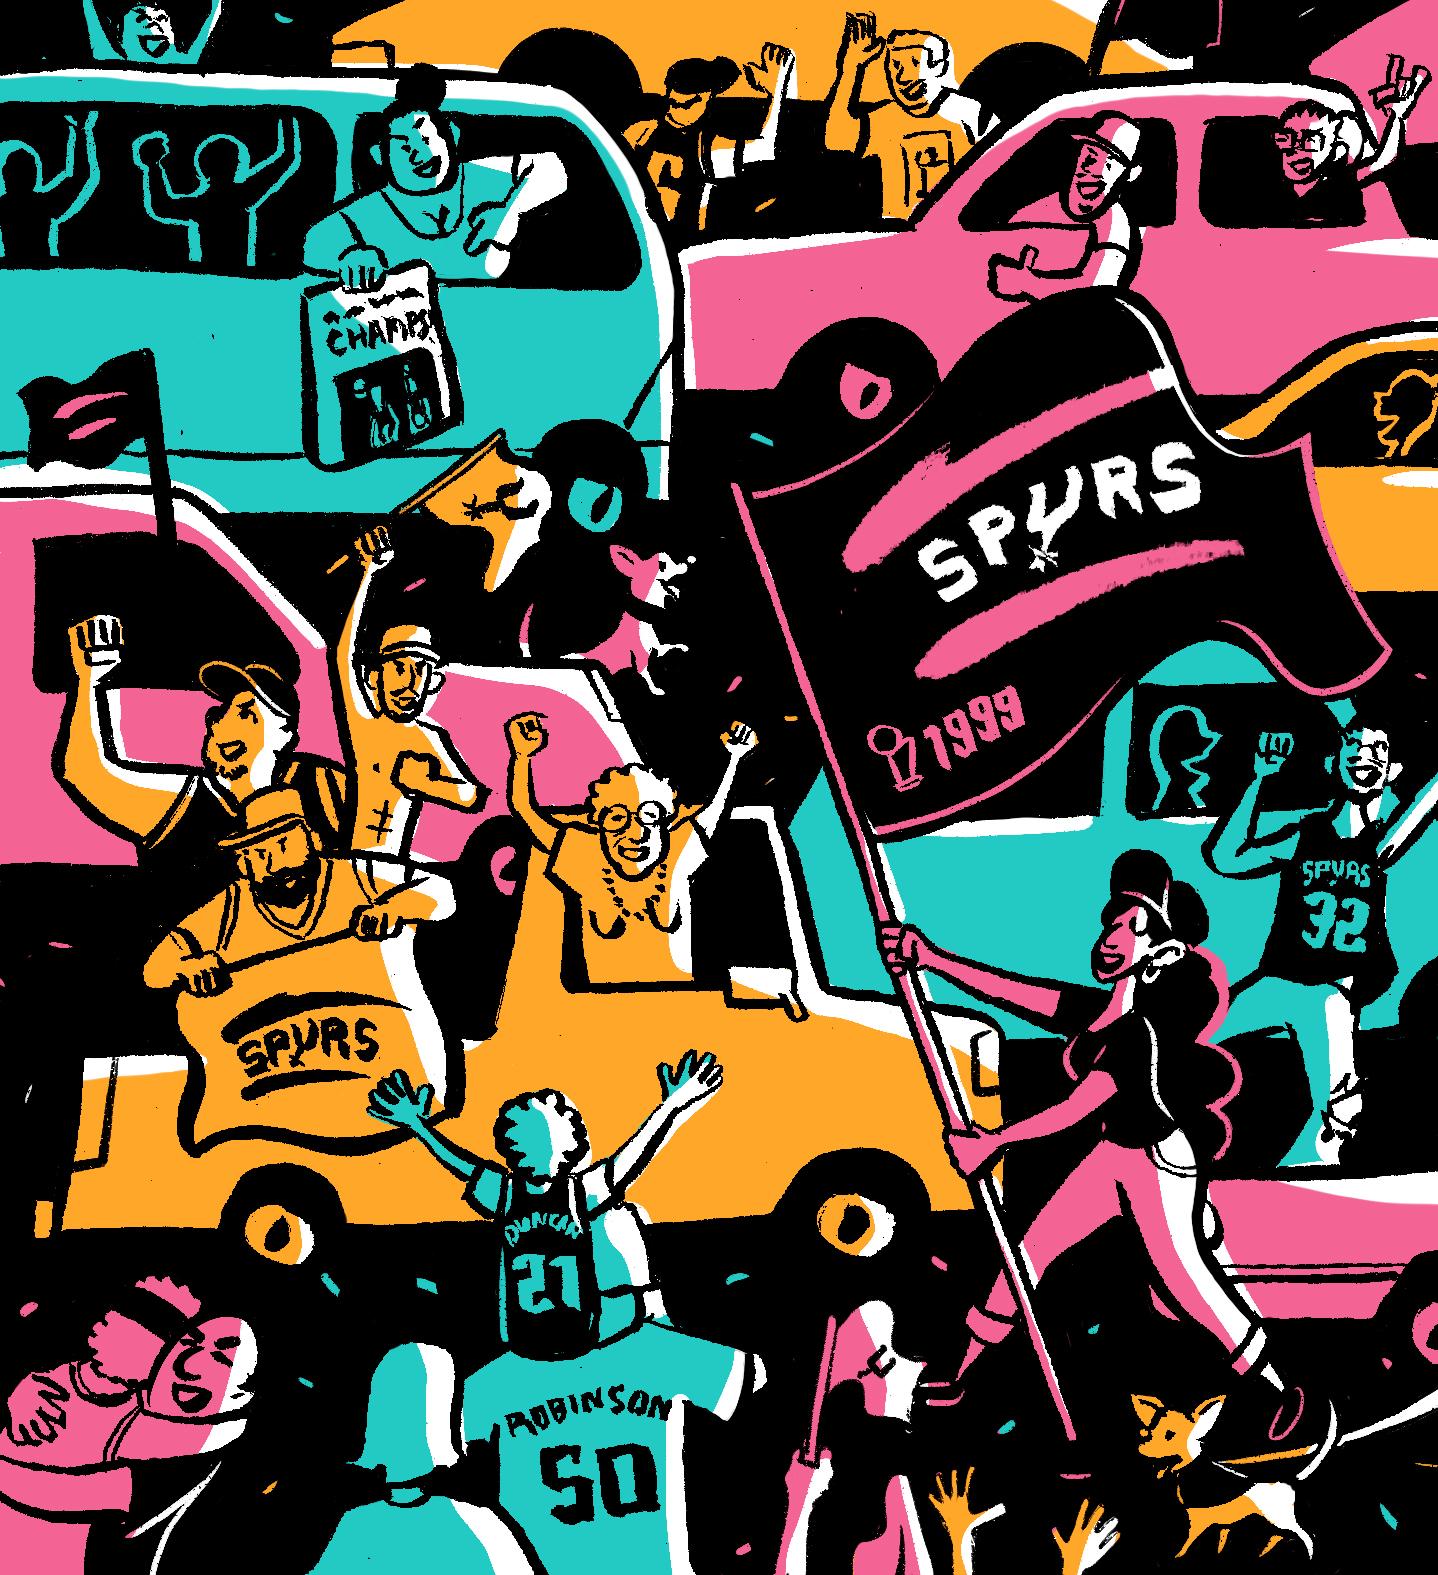 spurs-celebration.jpg